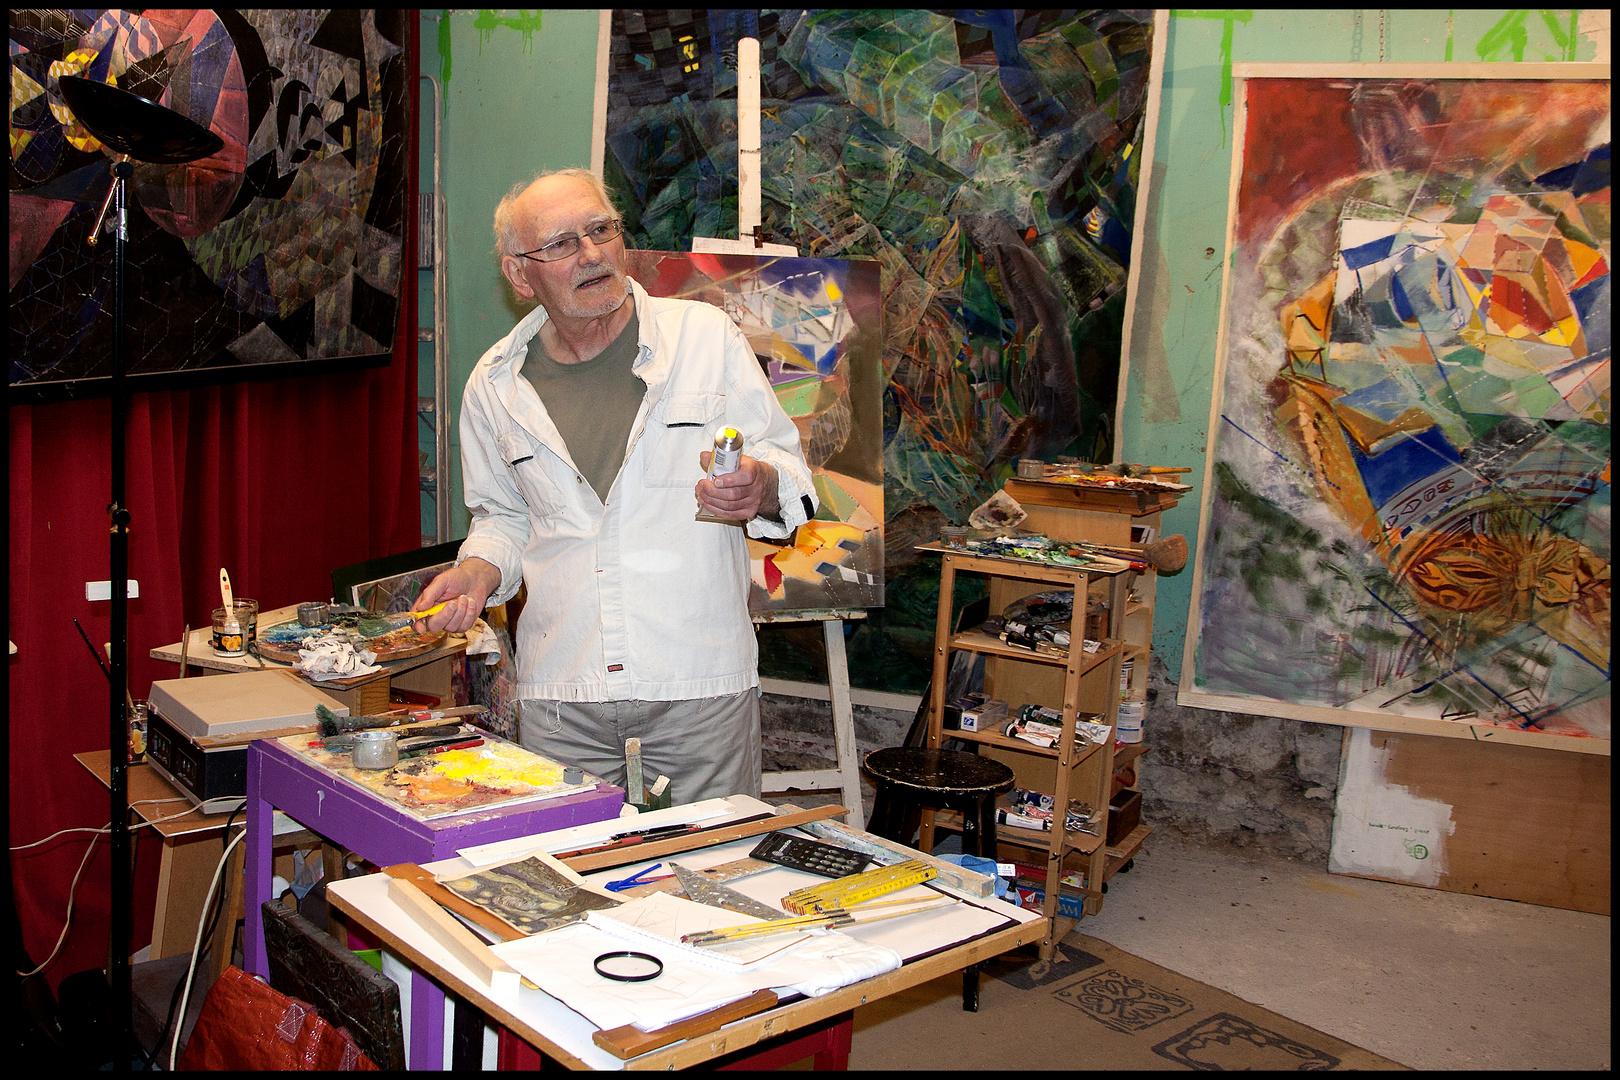 Painter COVY in his studio